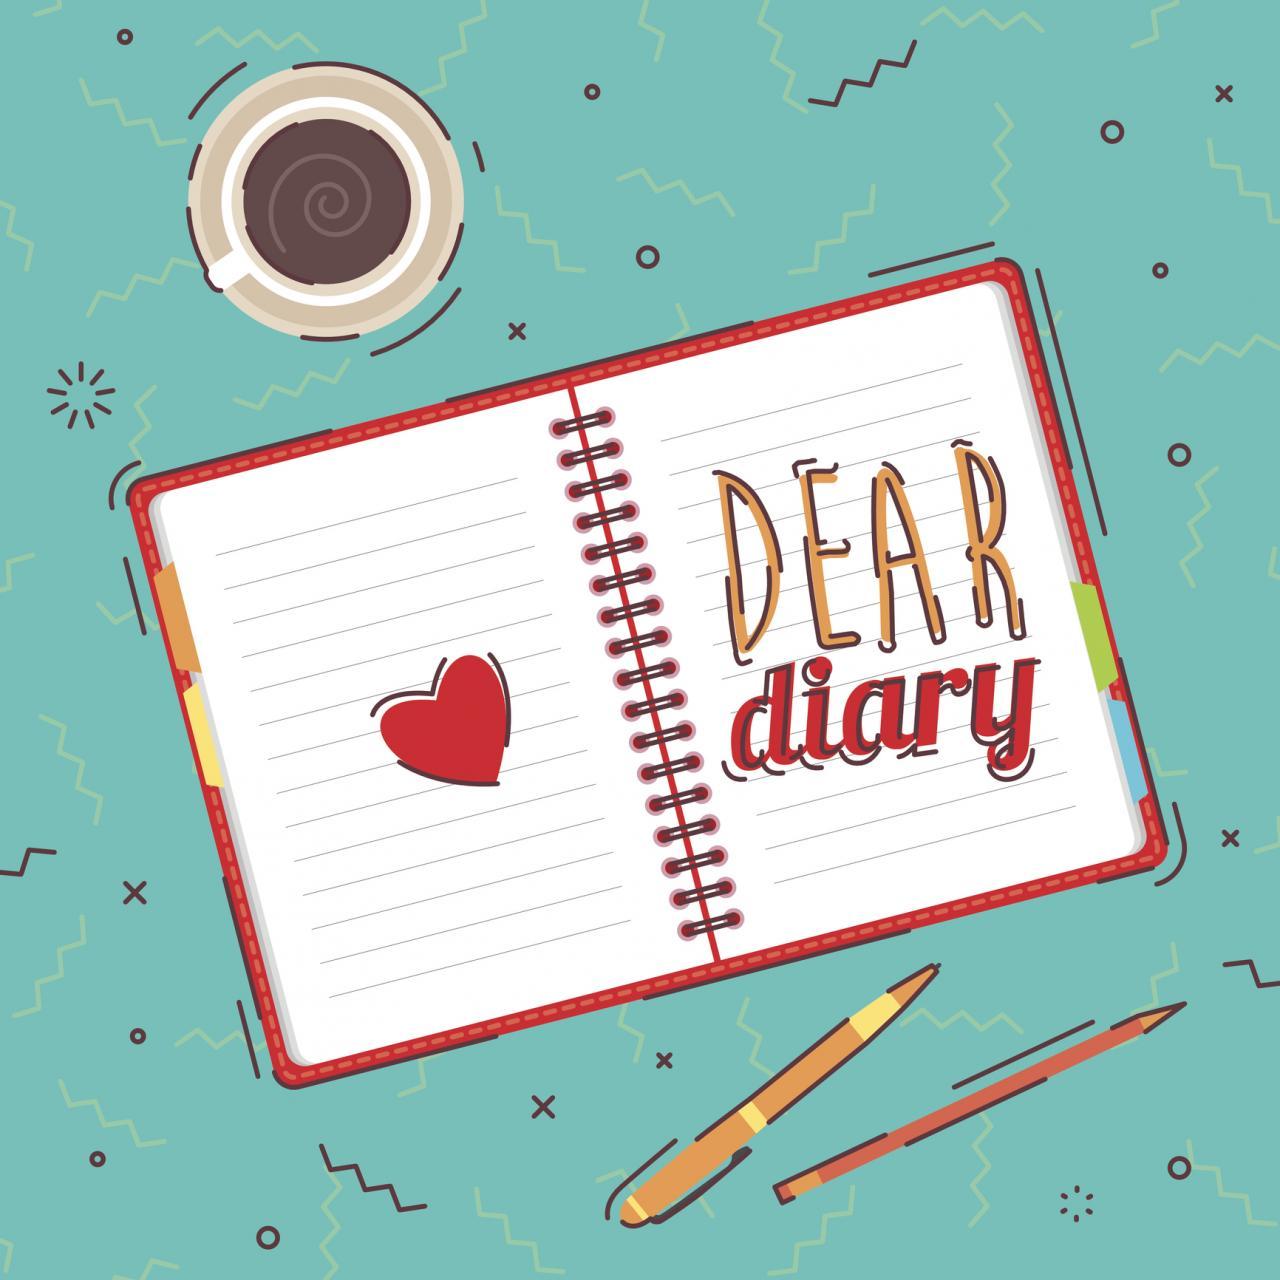 National Dear Diary Day